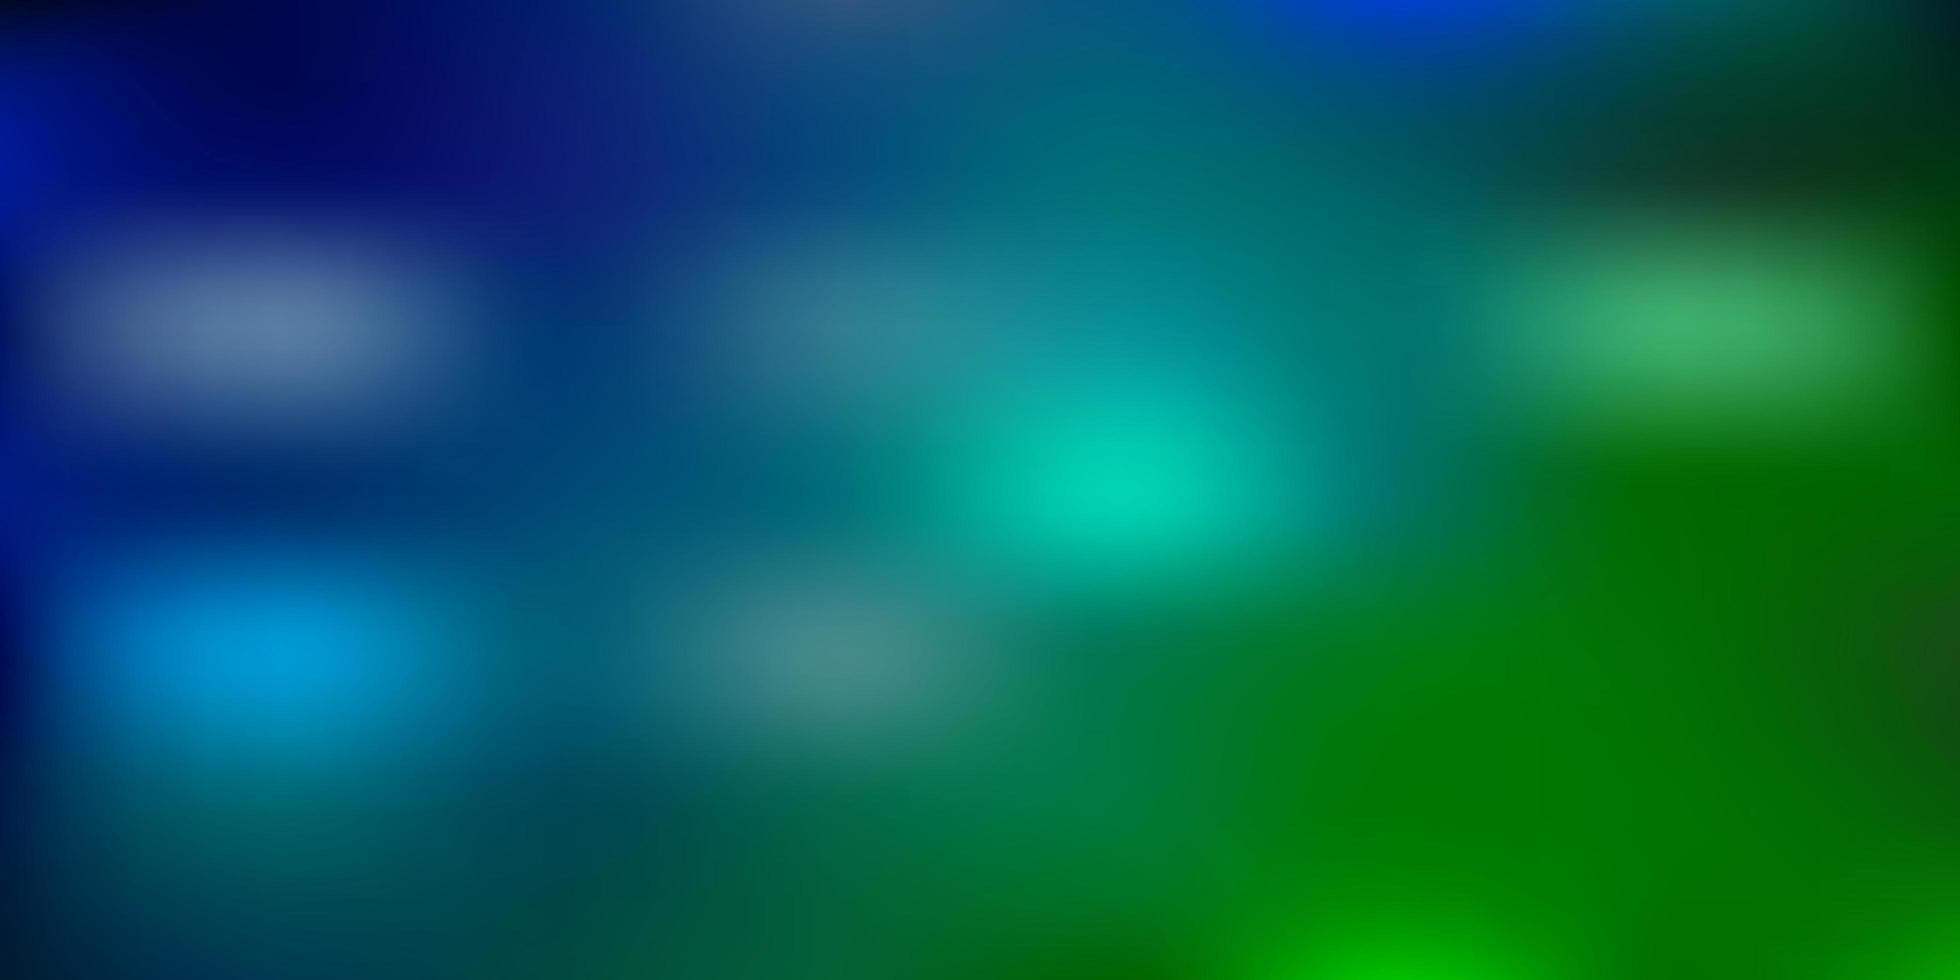 Light blue, green vector blurred layout.